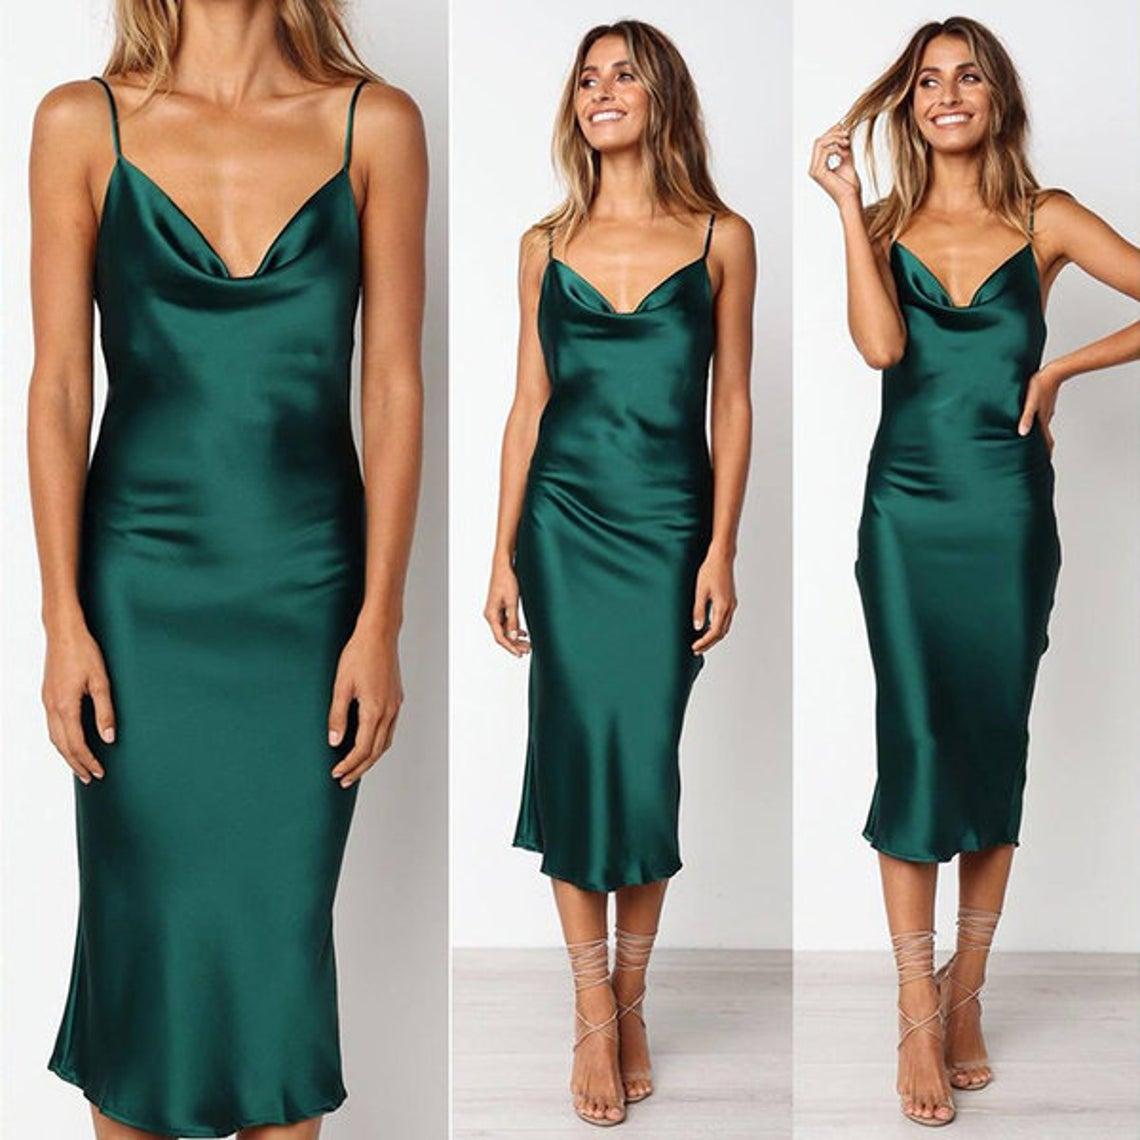 silk slip dress midi bias cut cowl neck Silk bridesmaid dress green silk satin dress Party dress Date dress